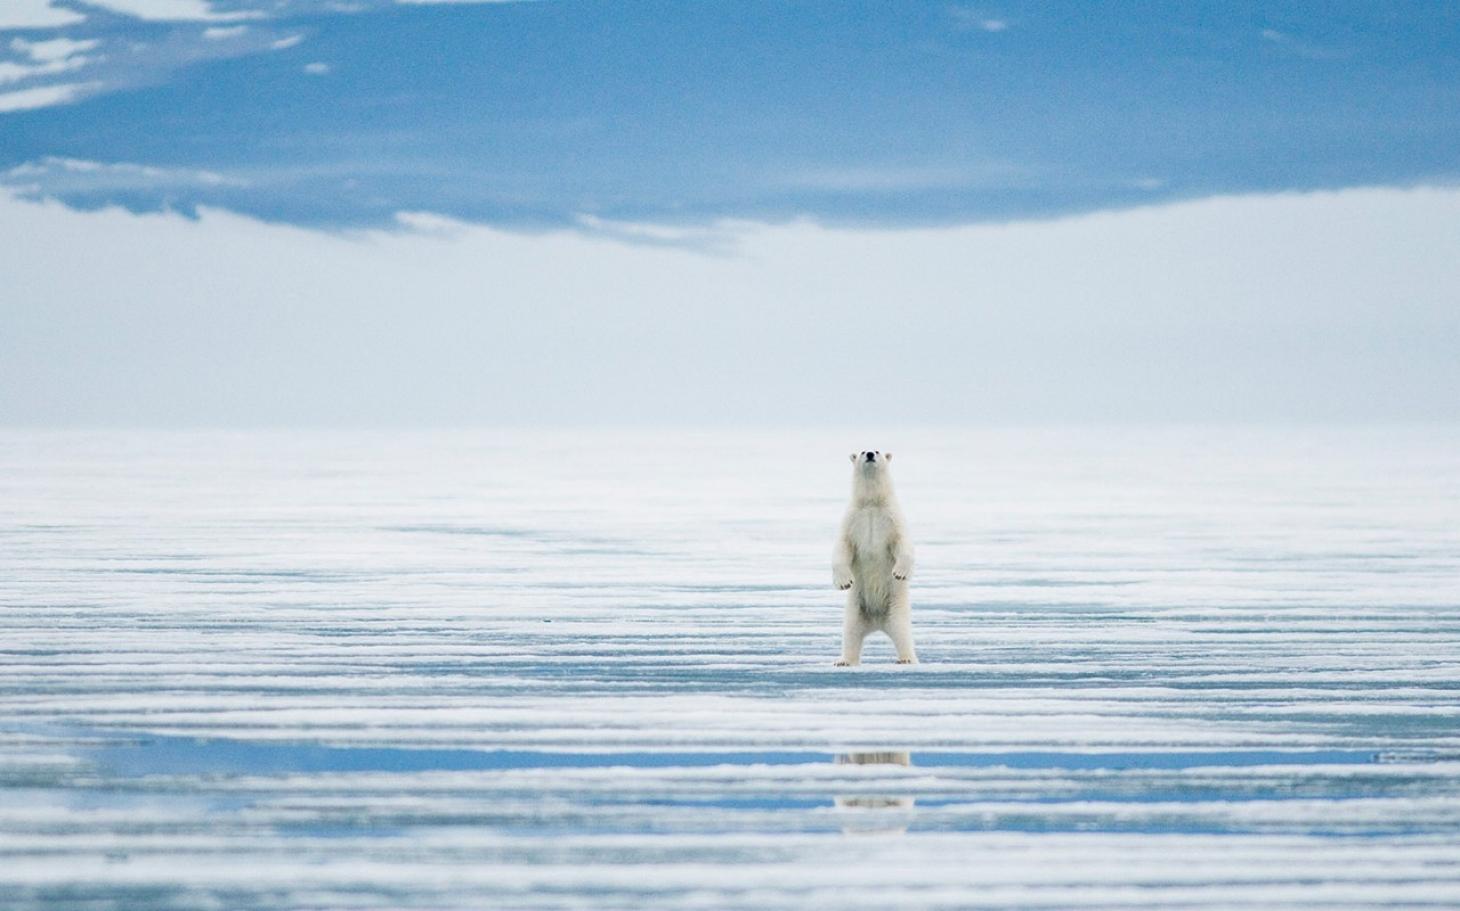 New Tv Ads Focus On Plight Of Polar Bears In Warming World